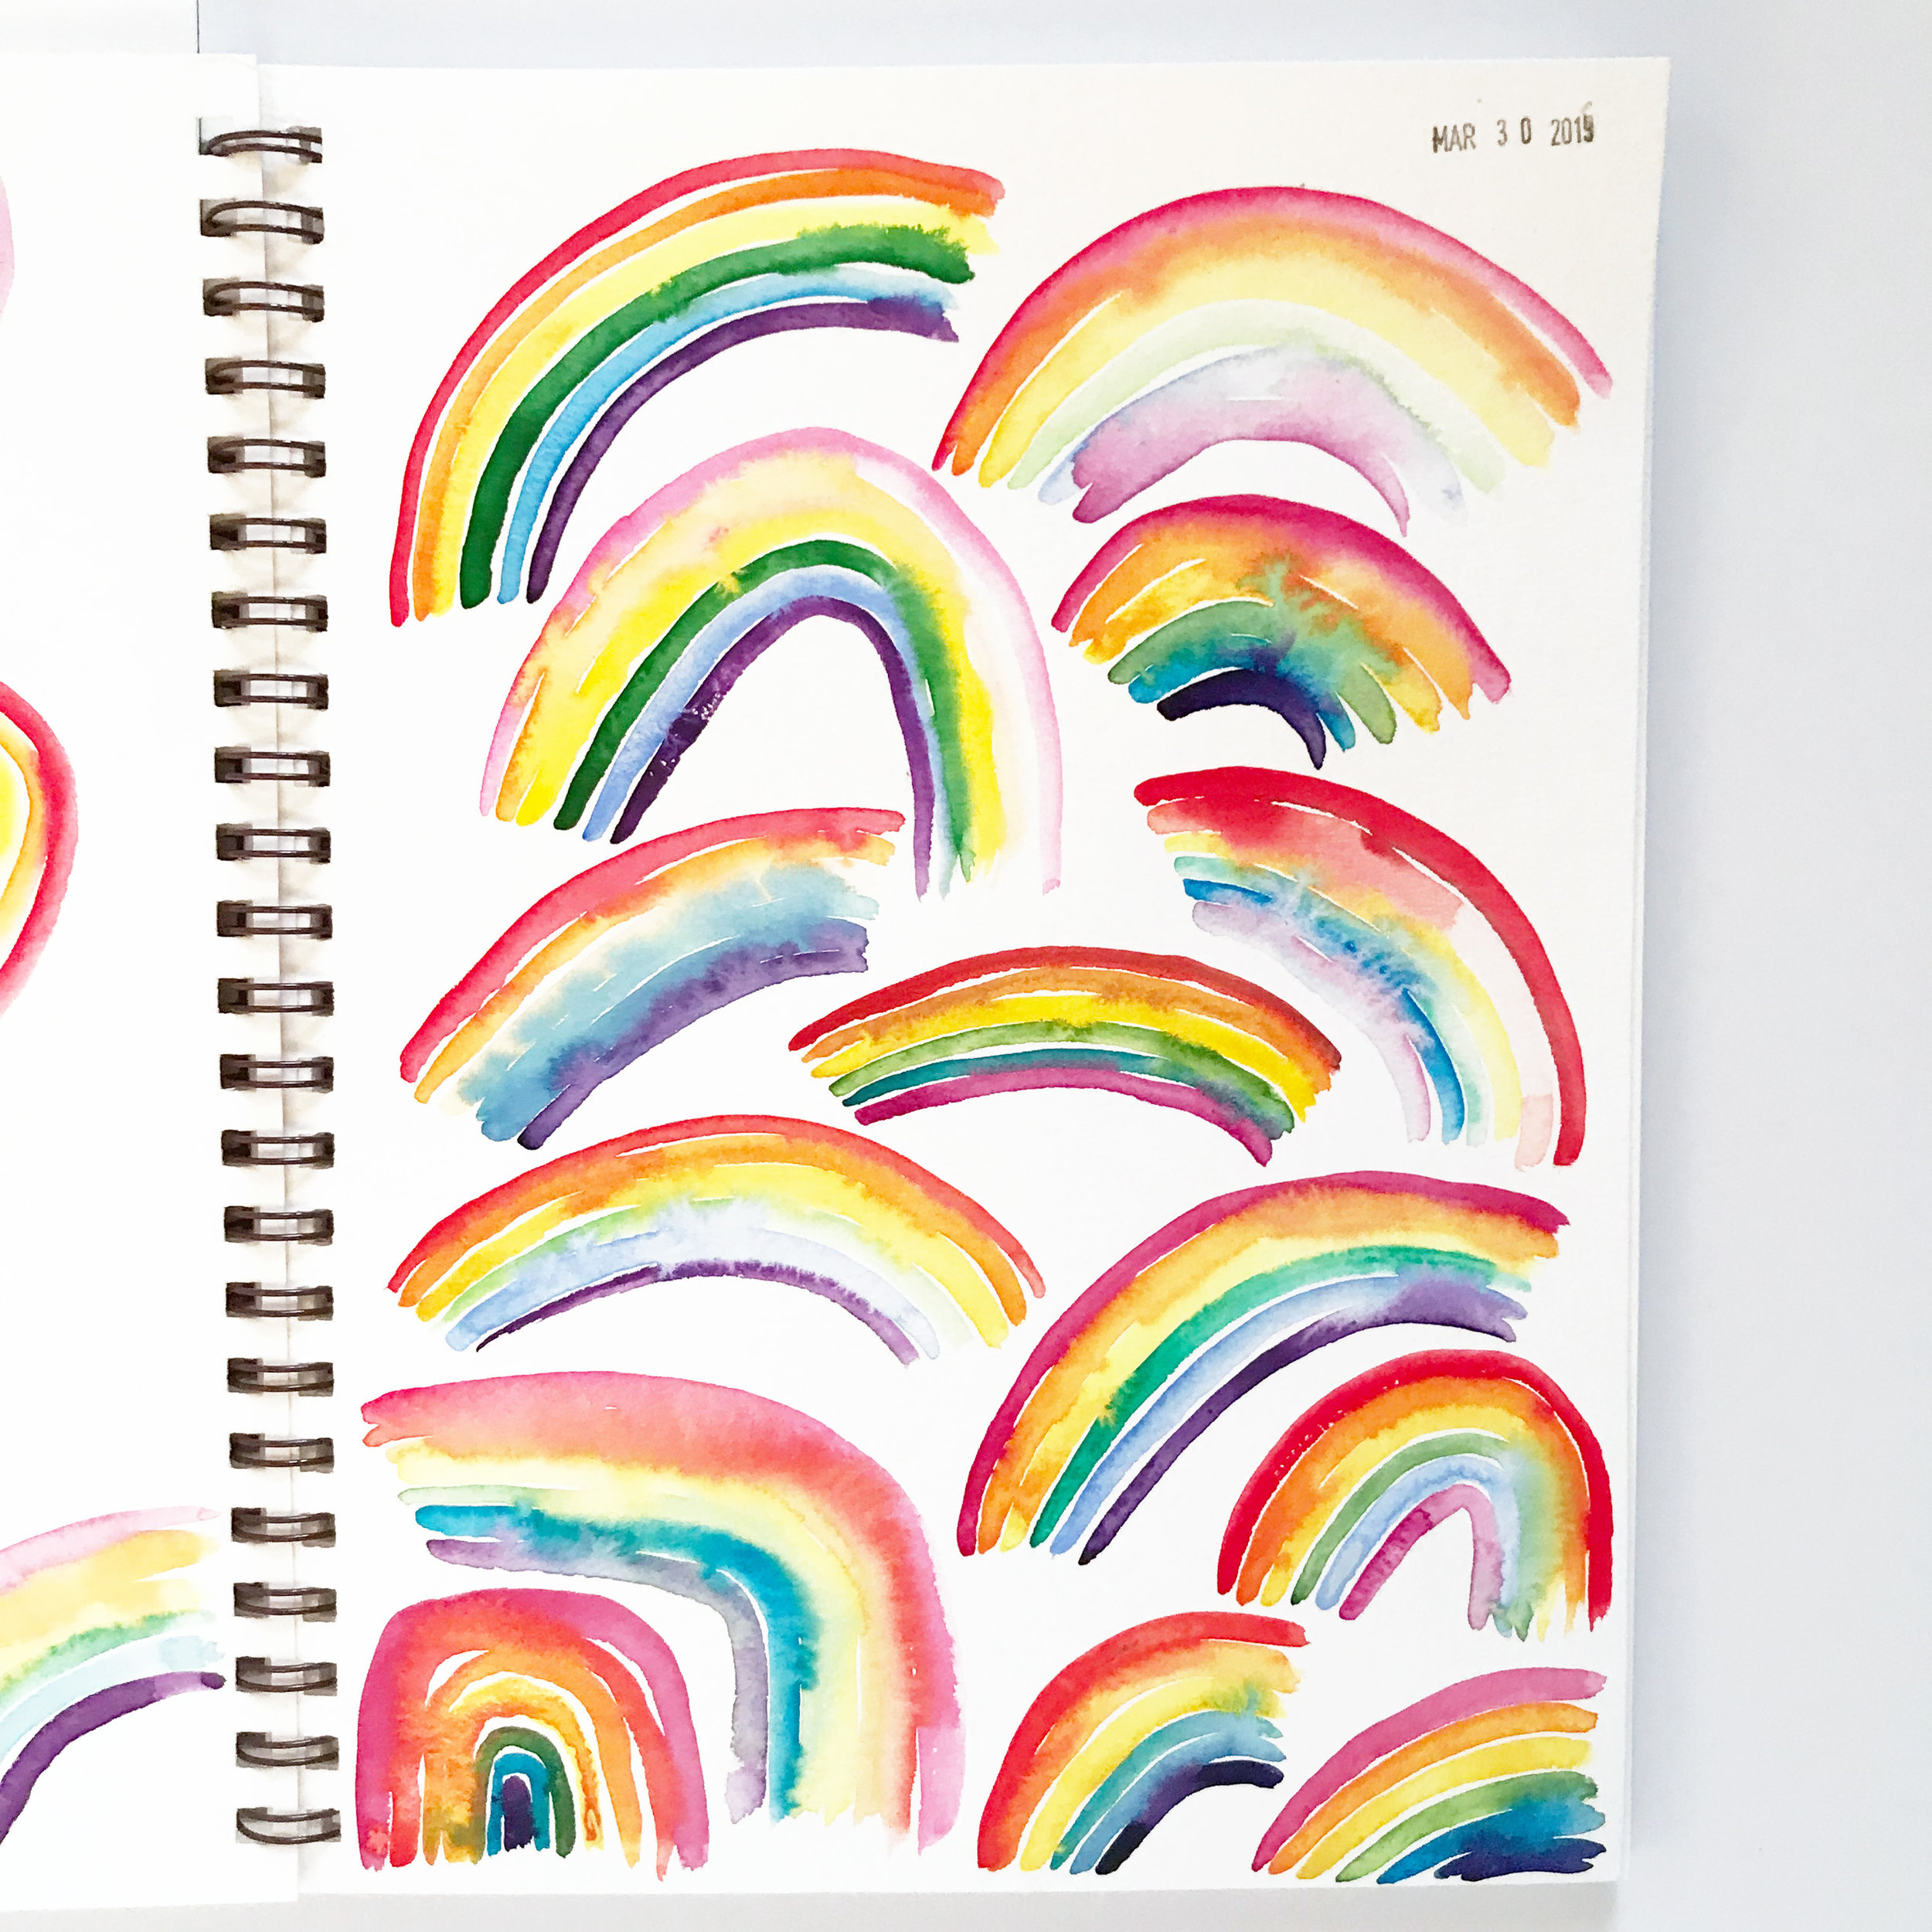 Watercolor Rainbows in Anne Butera's Sketchbook